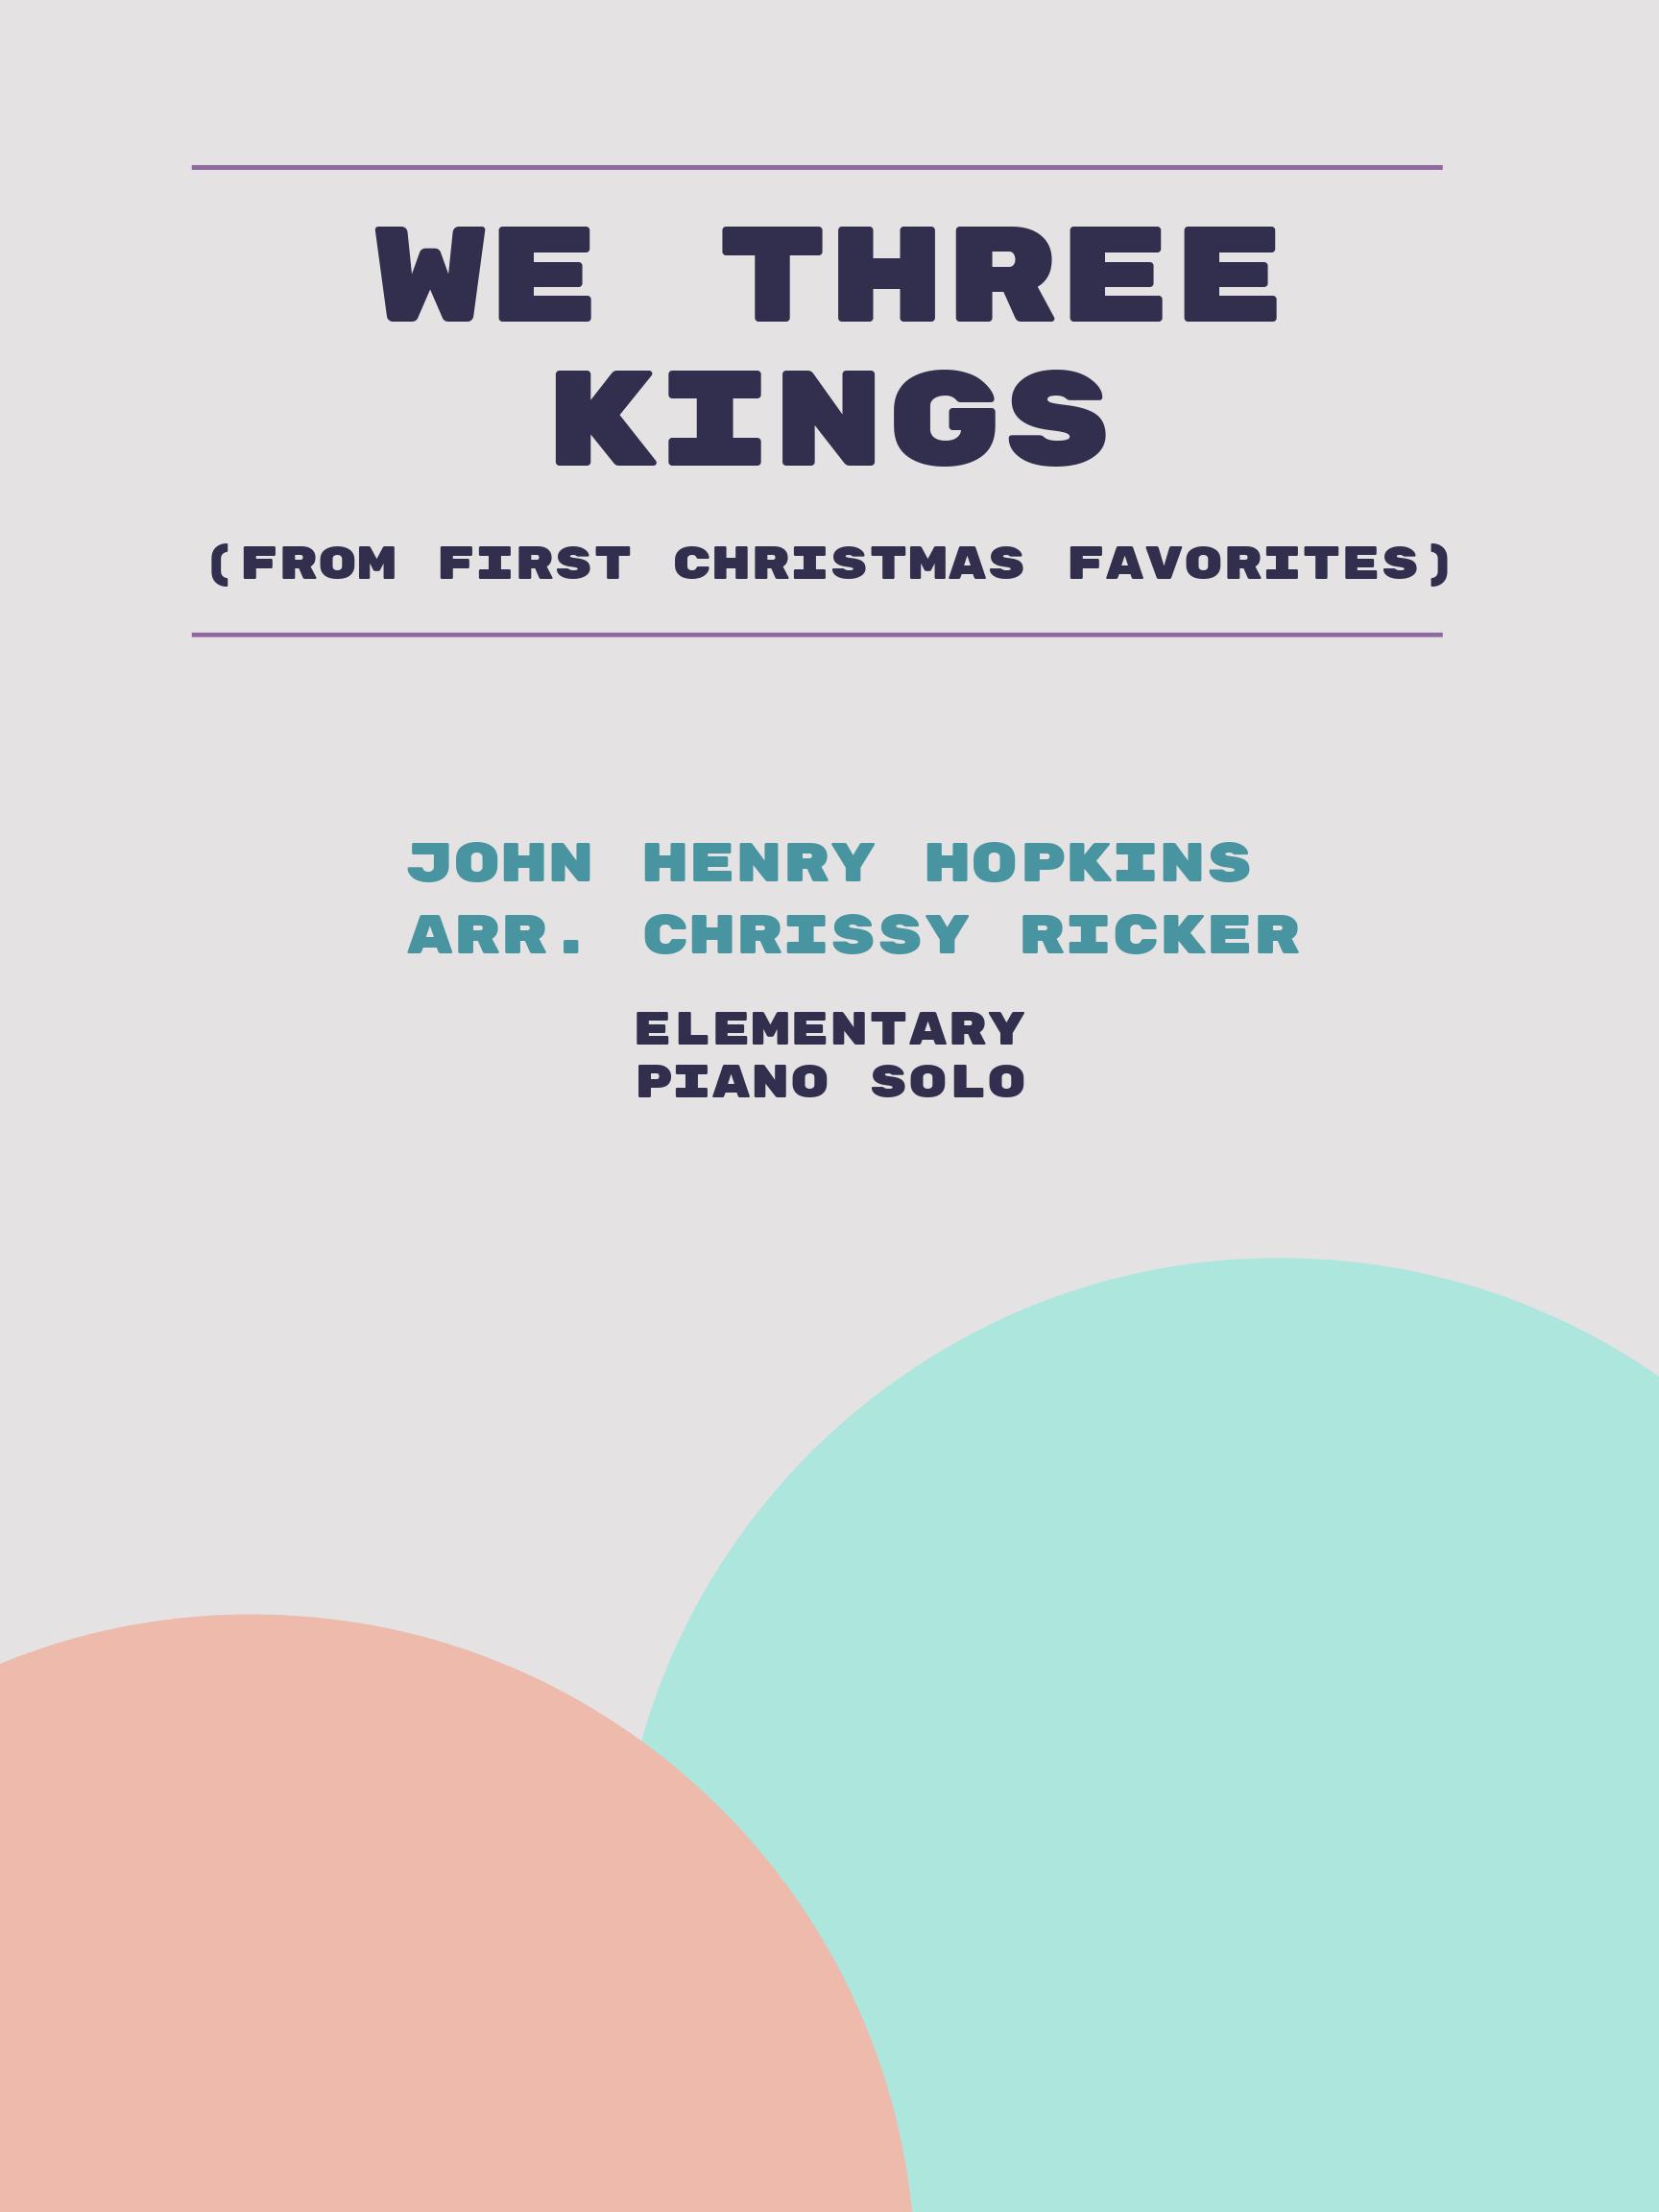 We Three Kings by John Henry Hopkins